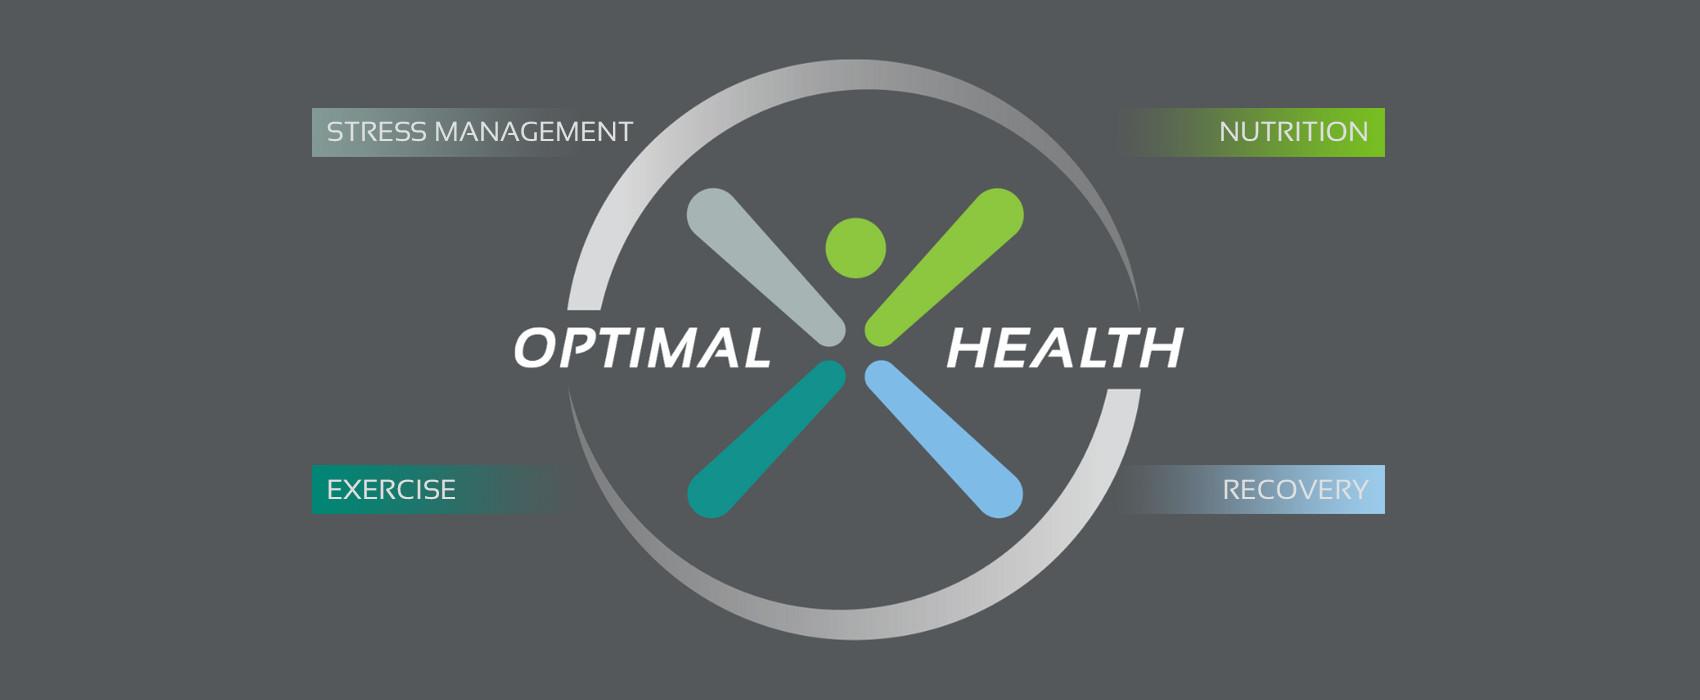 optimal health symbol with pillars